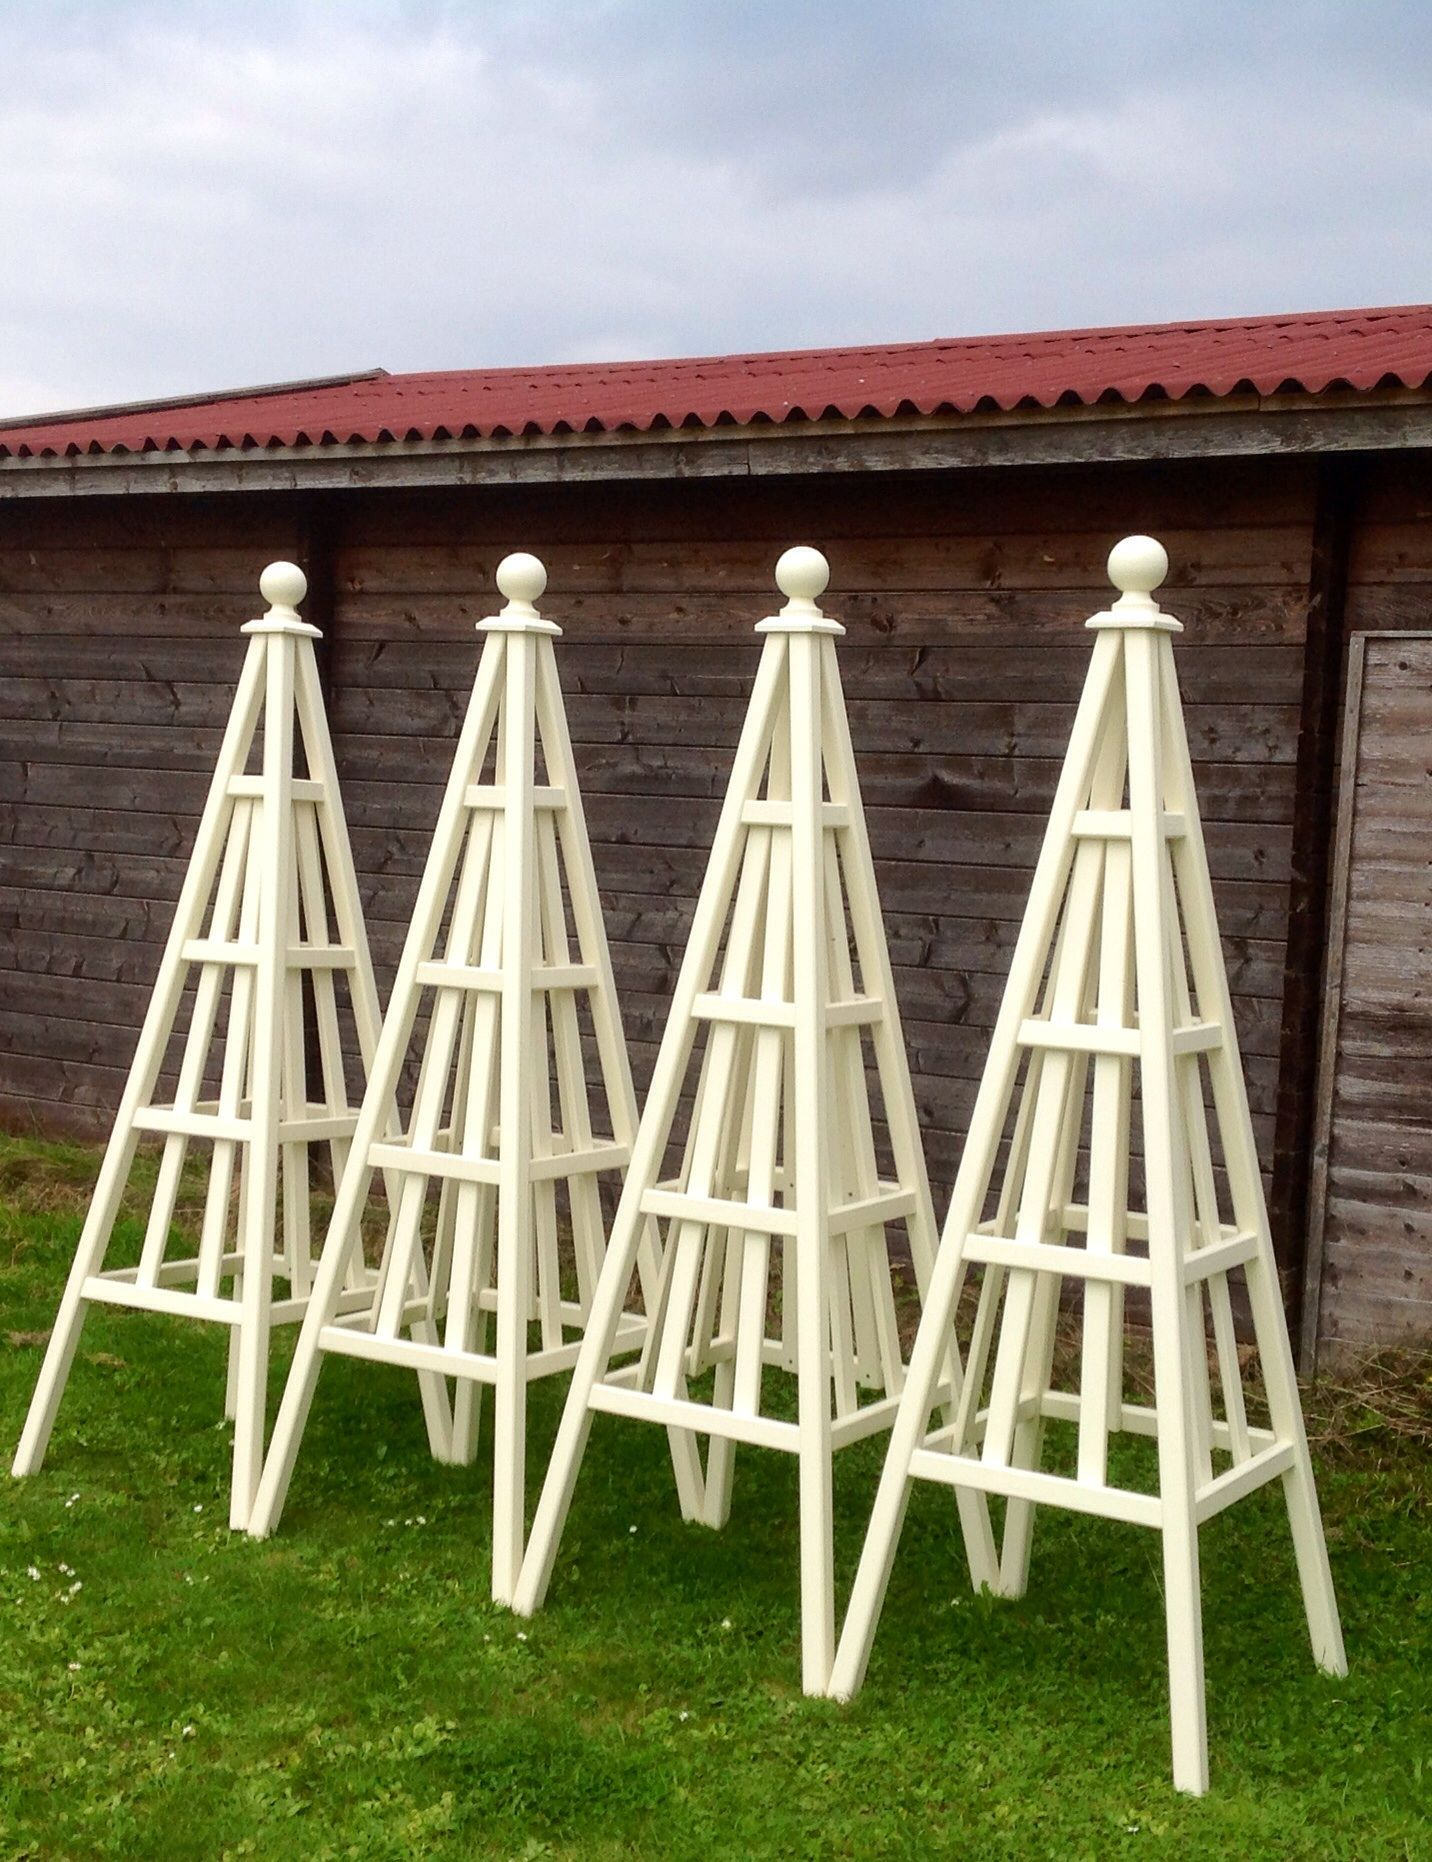 Painted Trellis Ideas Part - 39: 4 Sweet Pea Design Wooden Garden Obelisks Painted U0027New Whiteu0027 From Farrow U0026  Ball